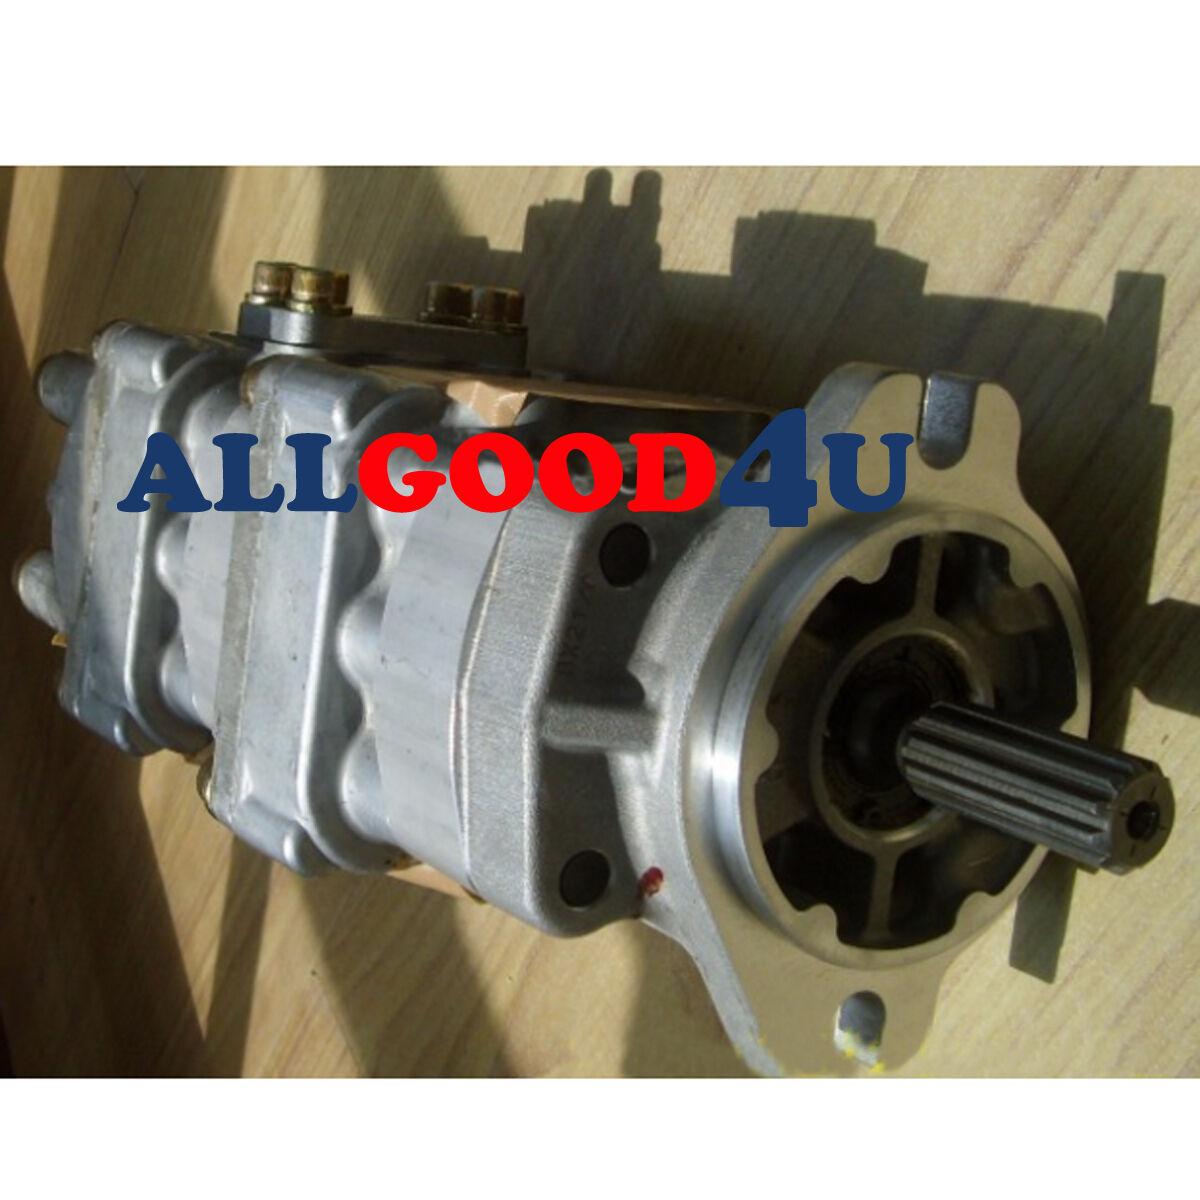 Details about Hydraulic Pump 705-41-08010 Fits For Komatsu Excavator PC40-6